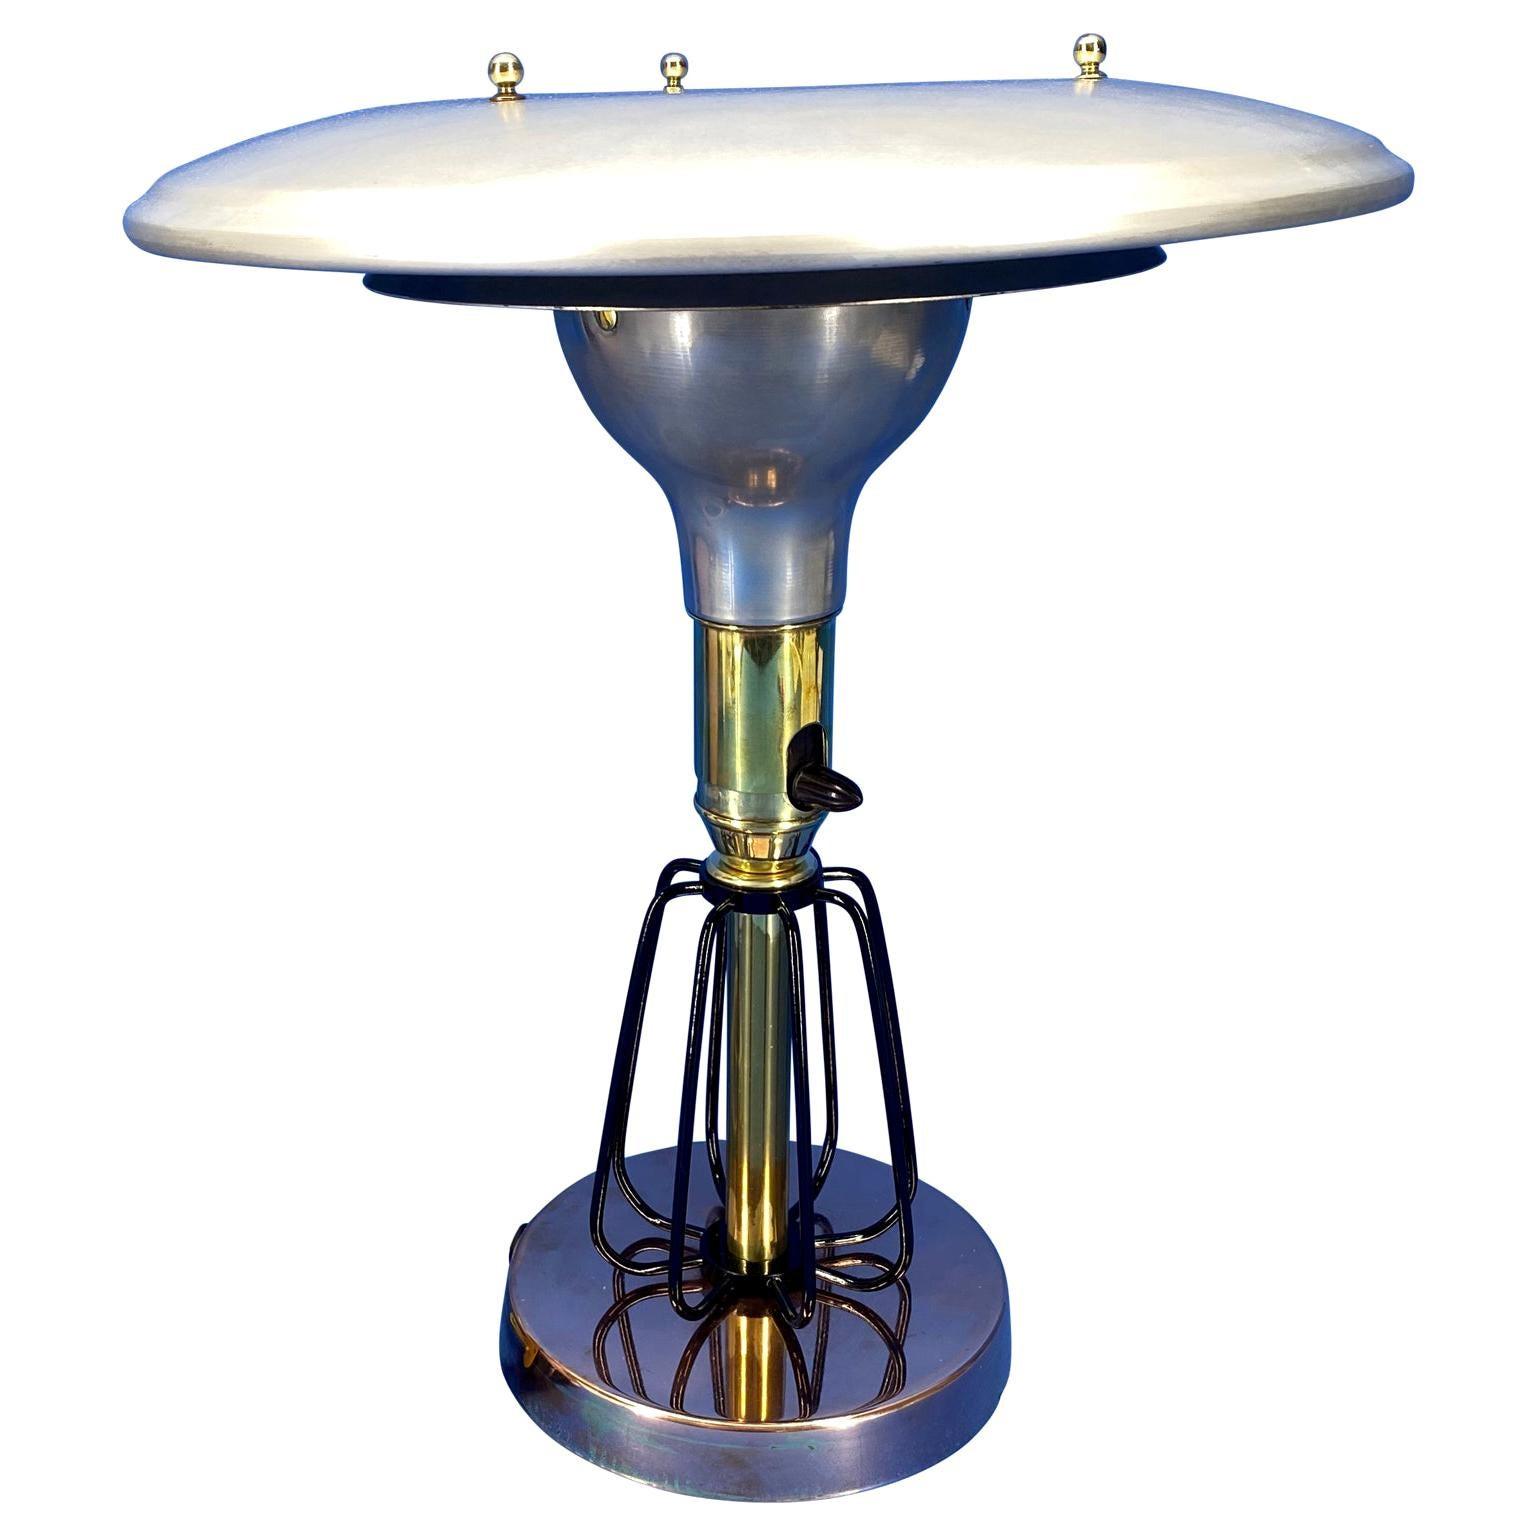 American Mid-Century Modern Brass and Chrome Desk Lamp